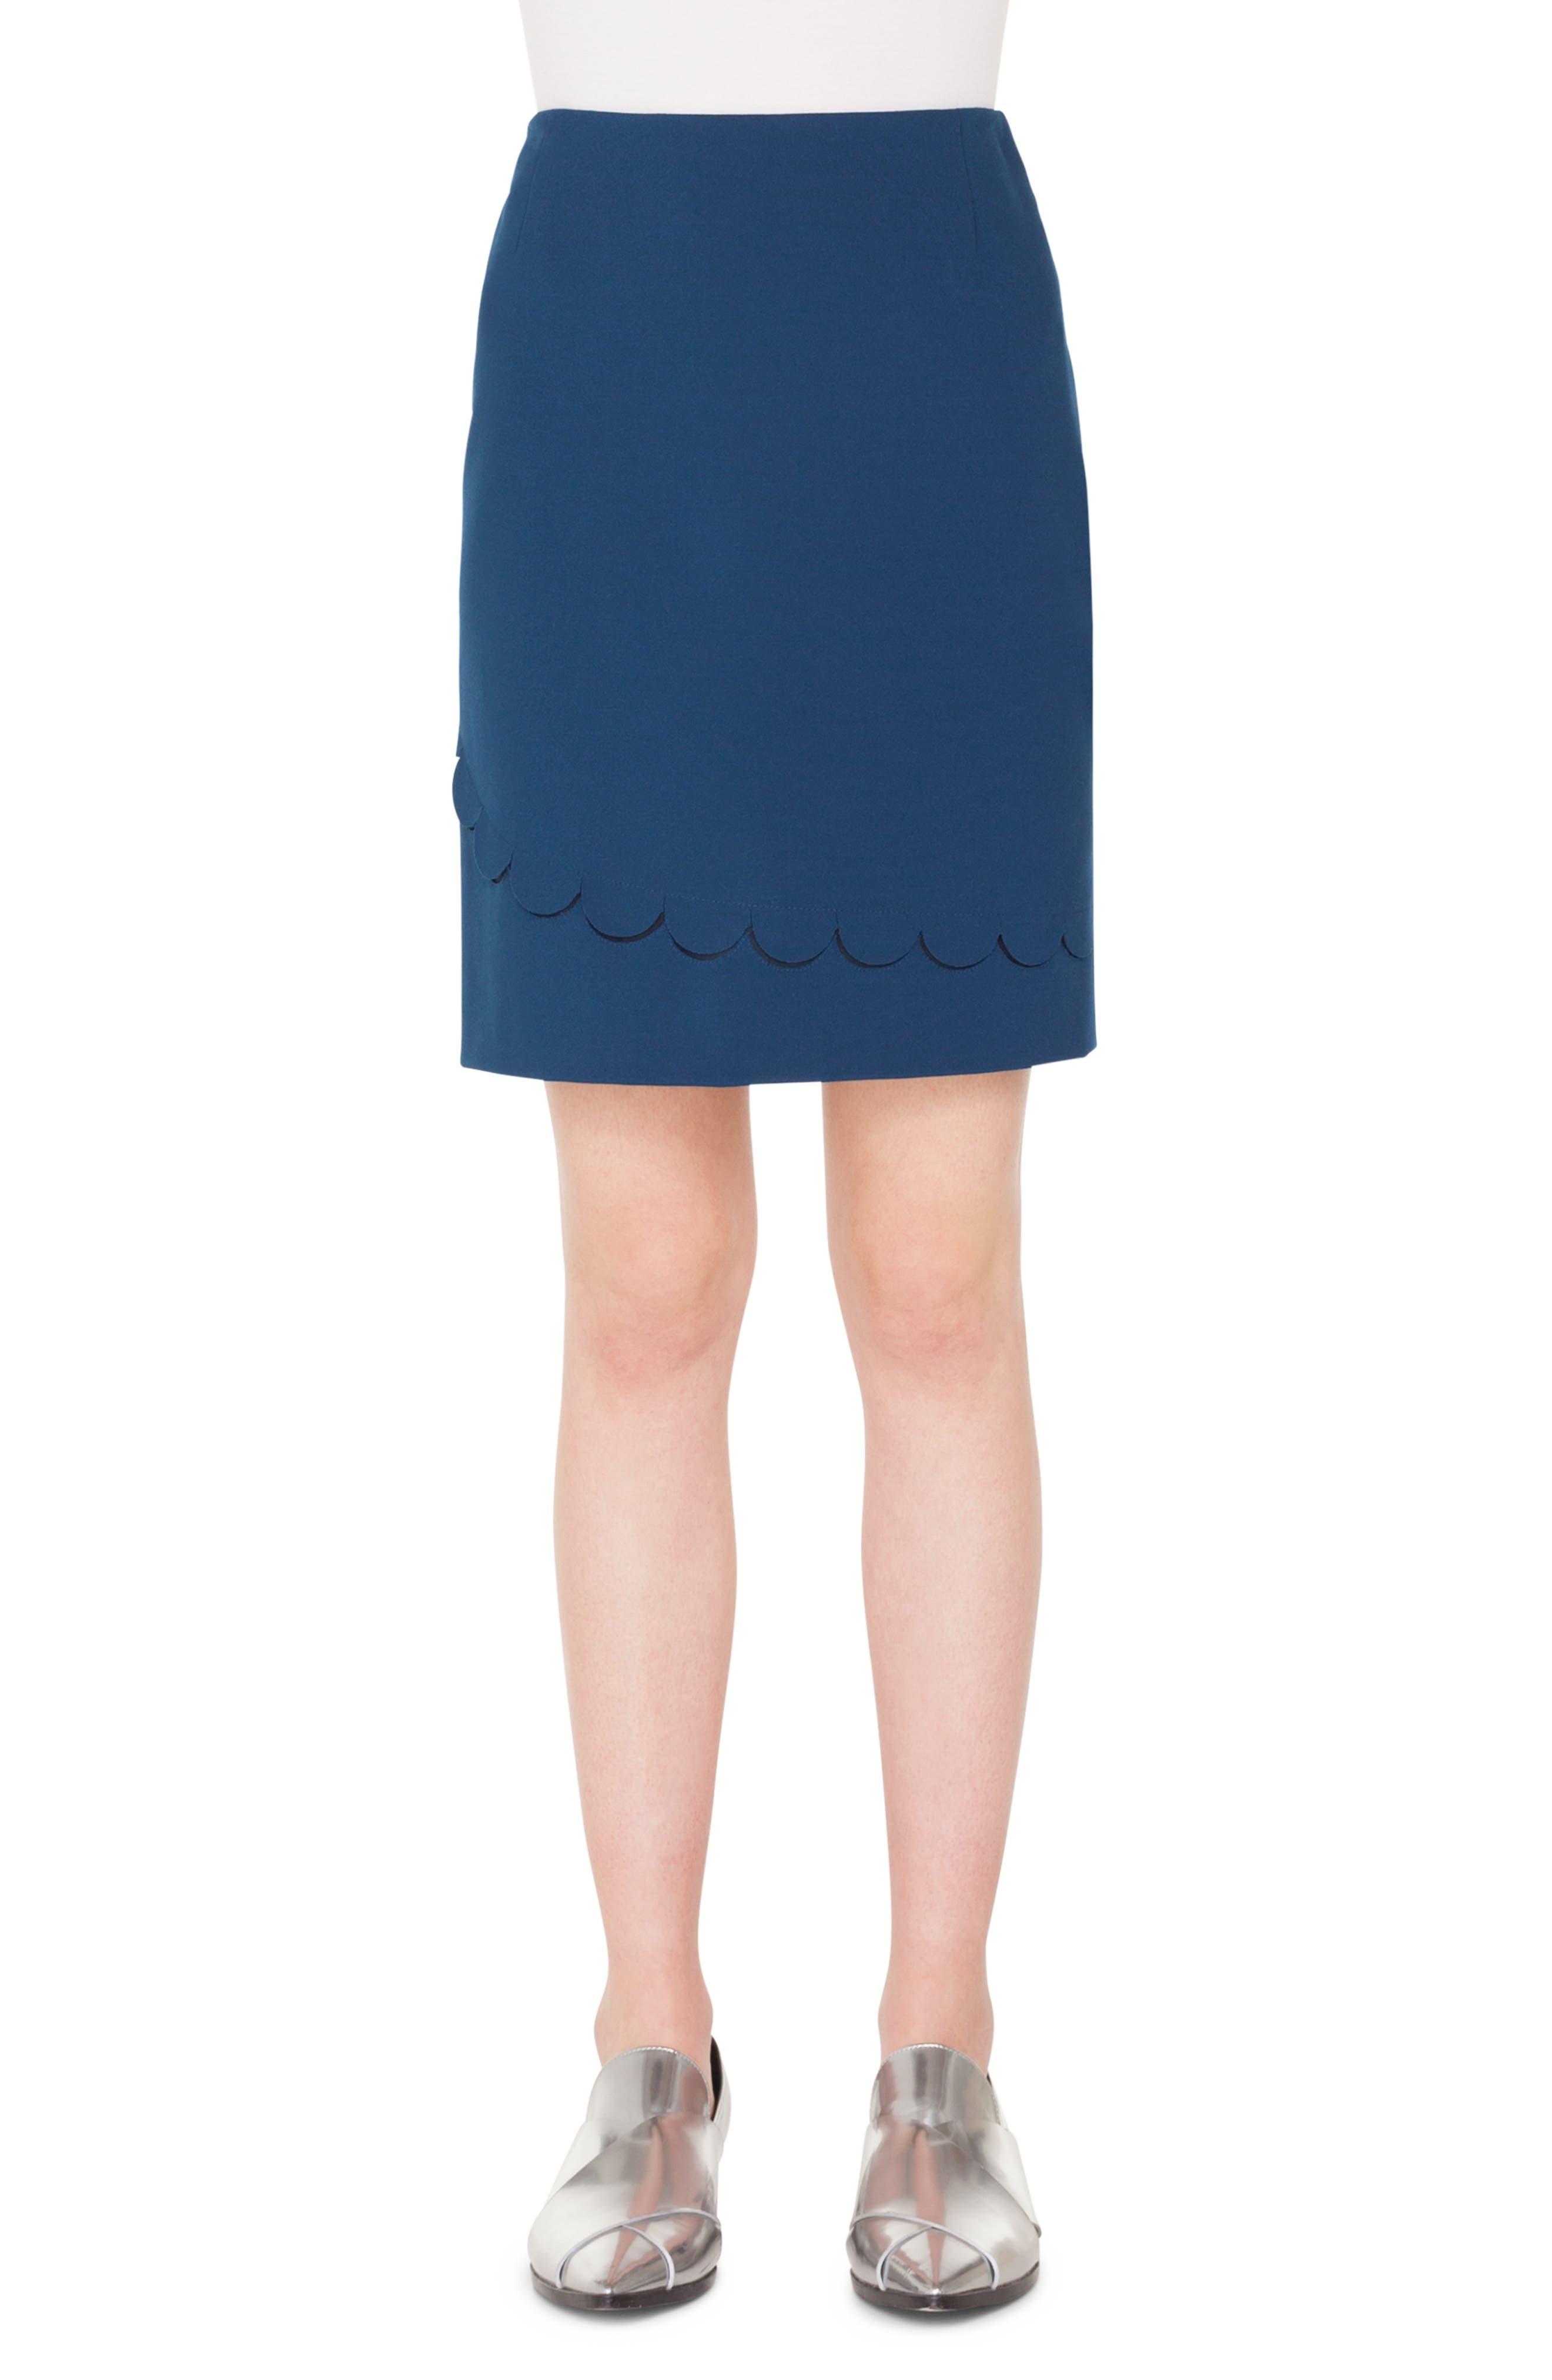 AKRIS PUNTO Scallop Detail Miniskirt, Main, color, BLU MARE